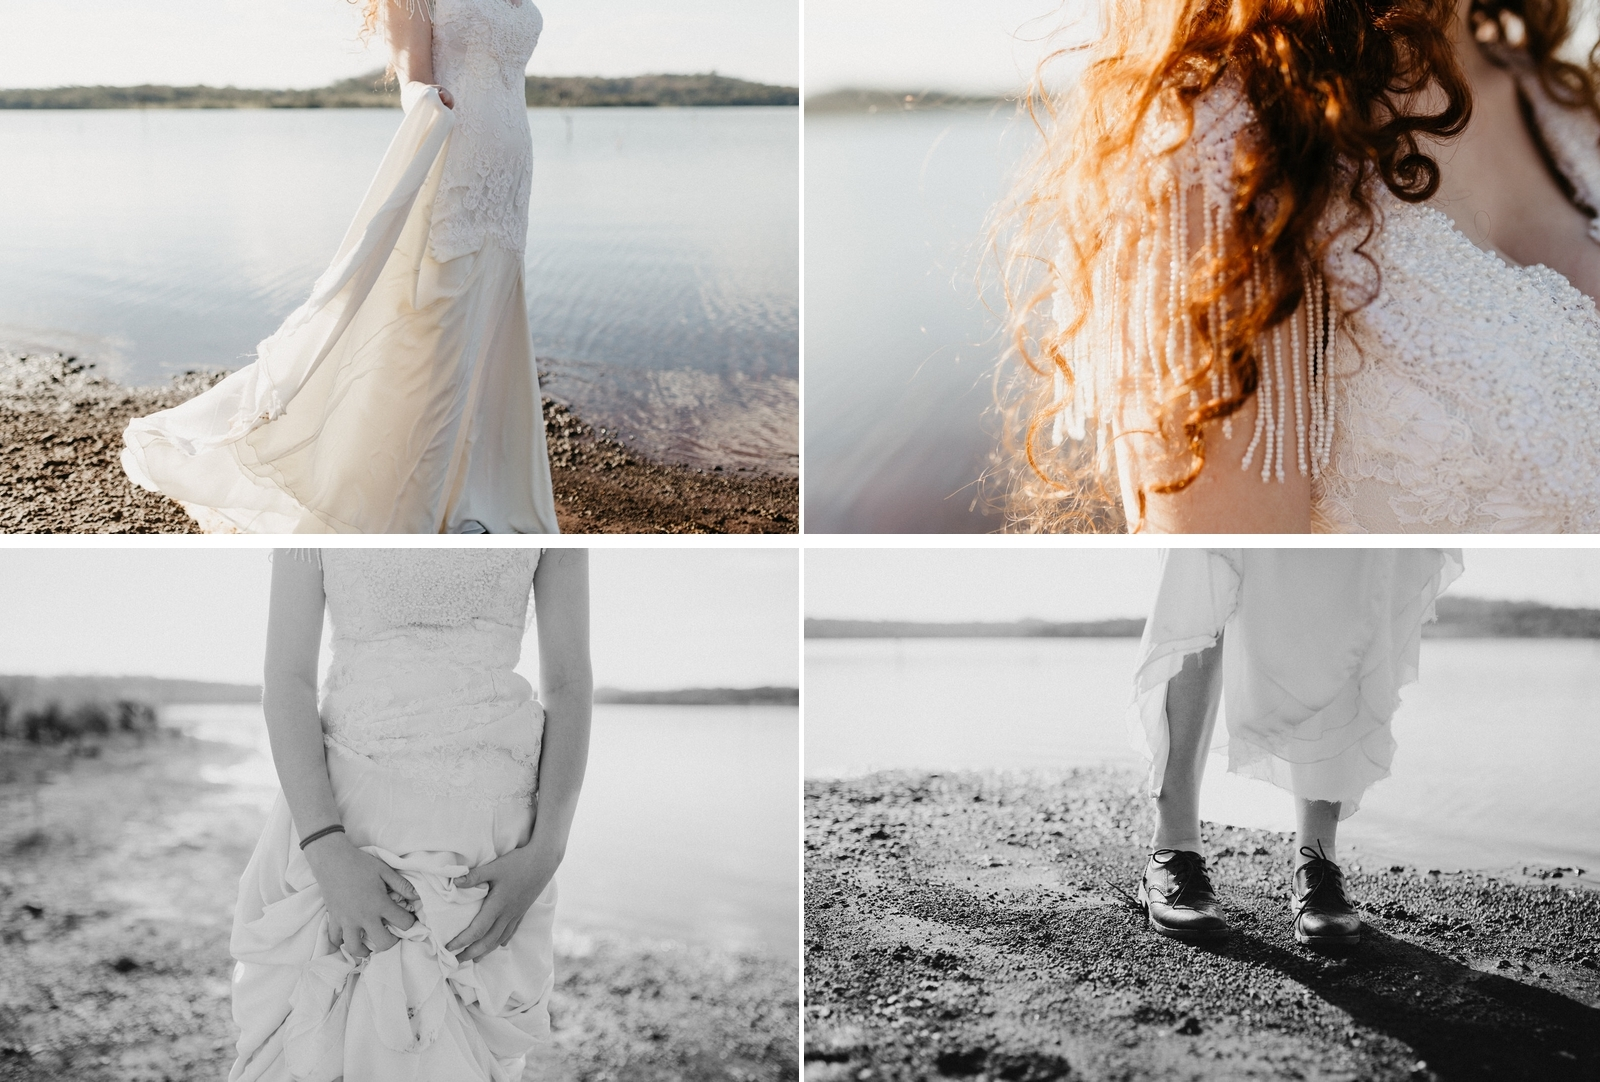 Céu_fotografia_casamentos_goiás_brasil_folk_noivas_brides_alternativo (100)2.jpg